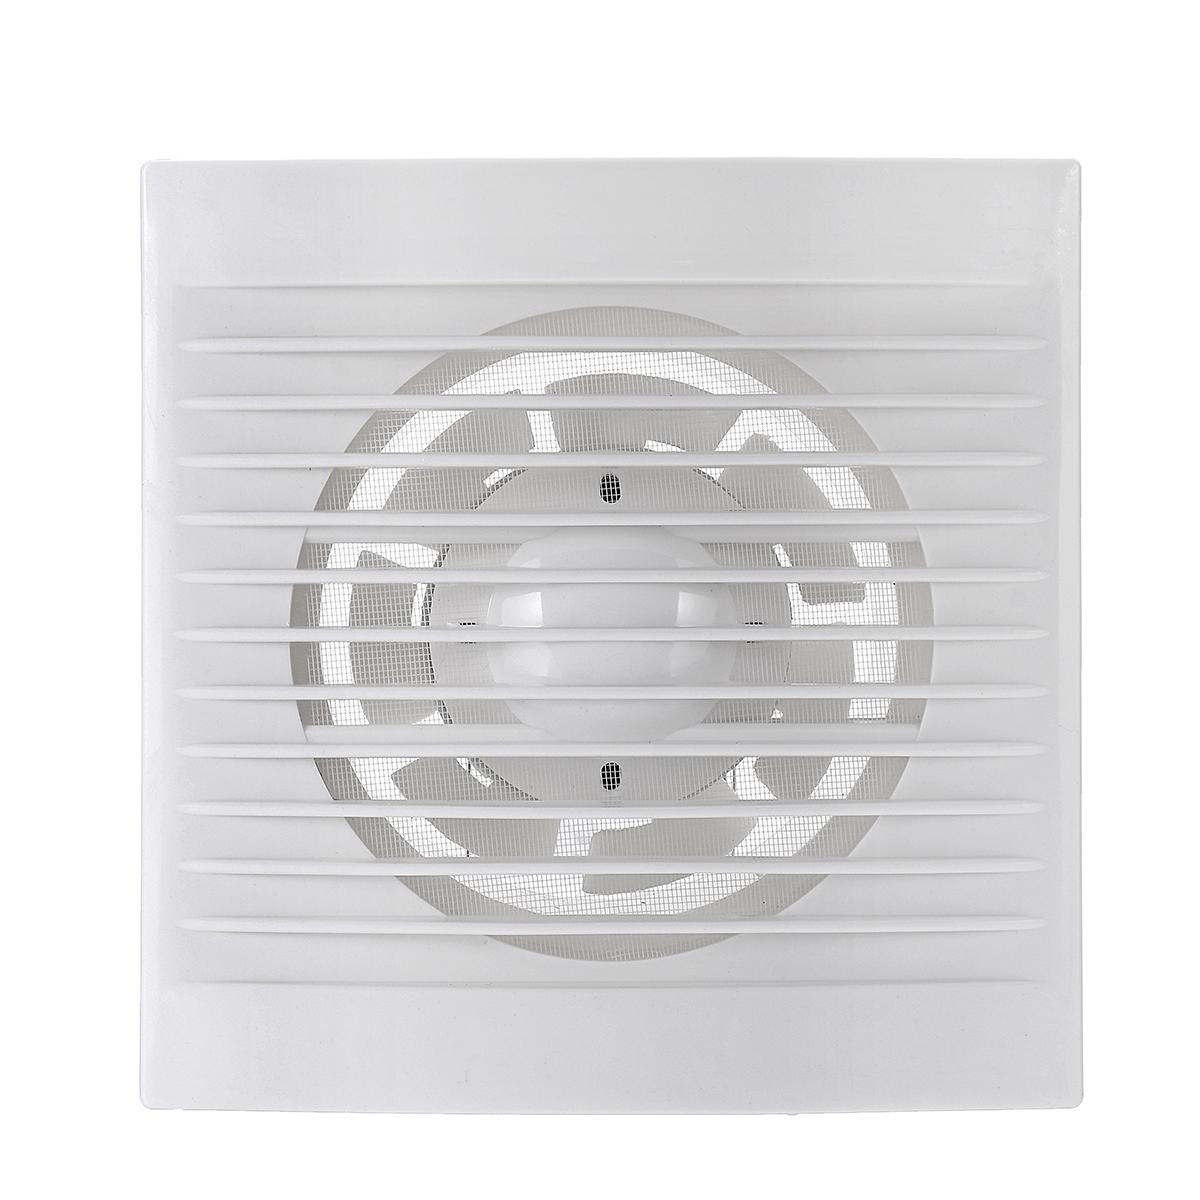 Ventilating Exhaust Extractor Fan for Bathroom Toilet Kitchen Window Ventilation Fan Air Circulator